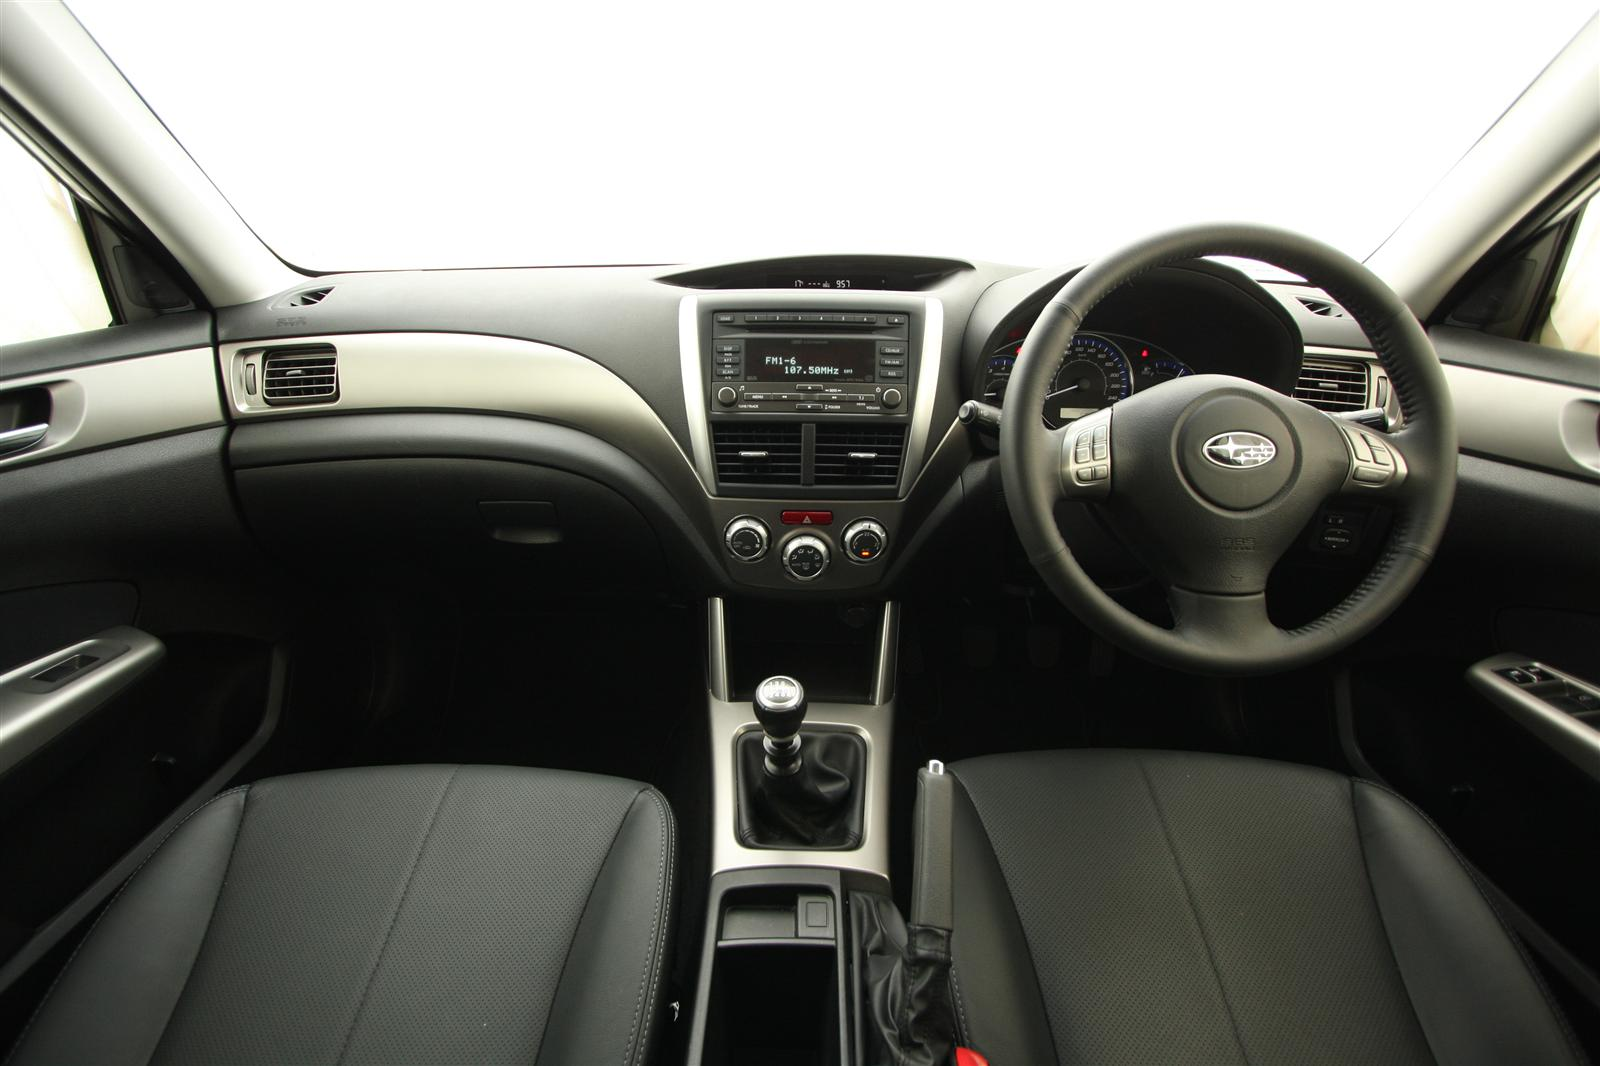 2010_subaru_forester_diesel_road_test_review_interior_17